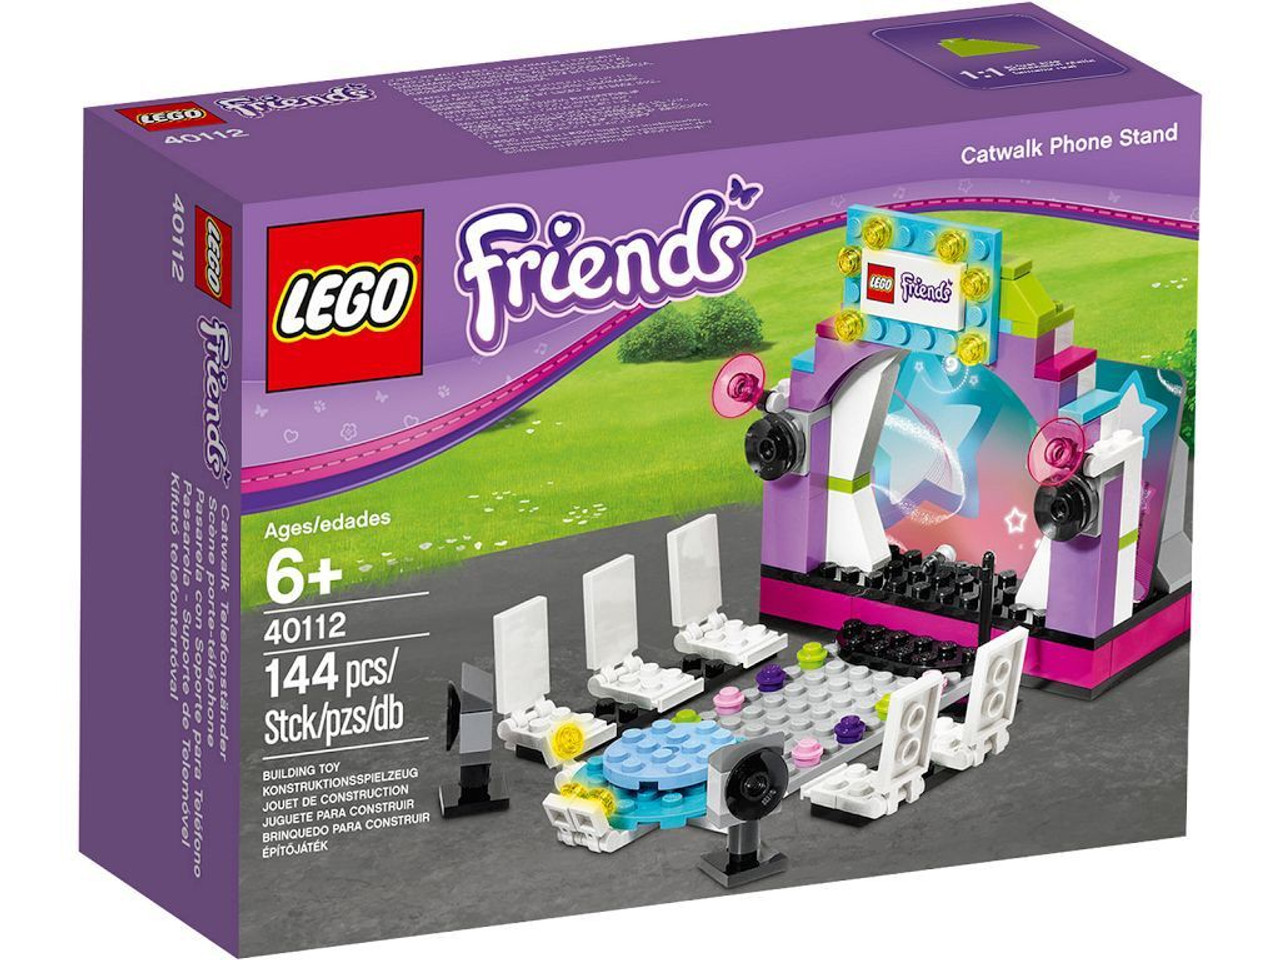 LEGO Friends Cat Walk Phone Stand Set #40112